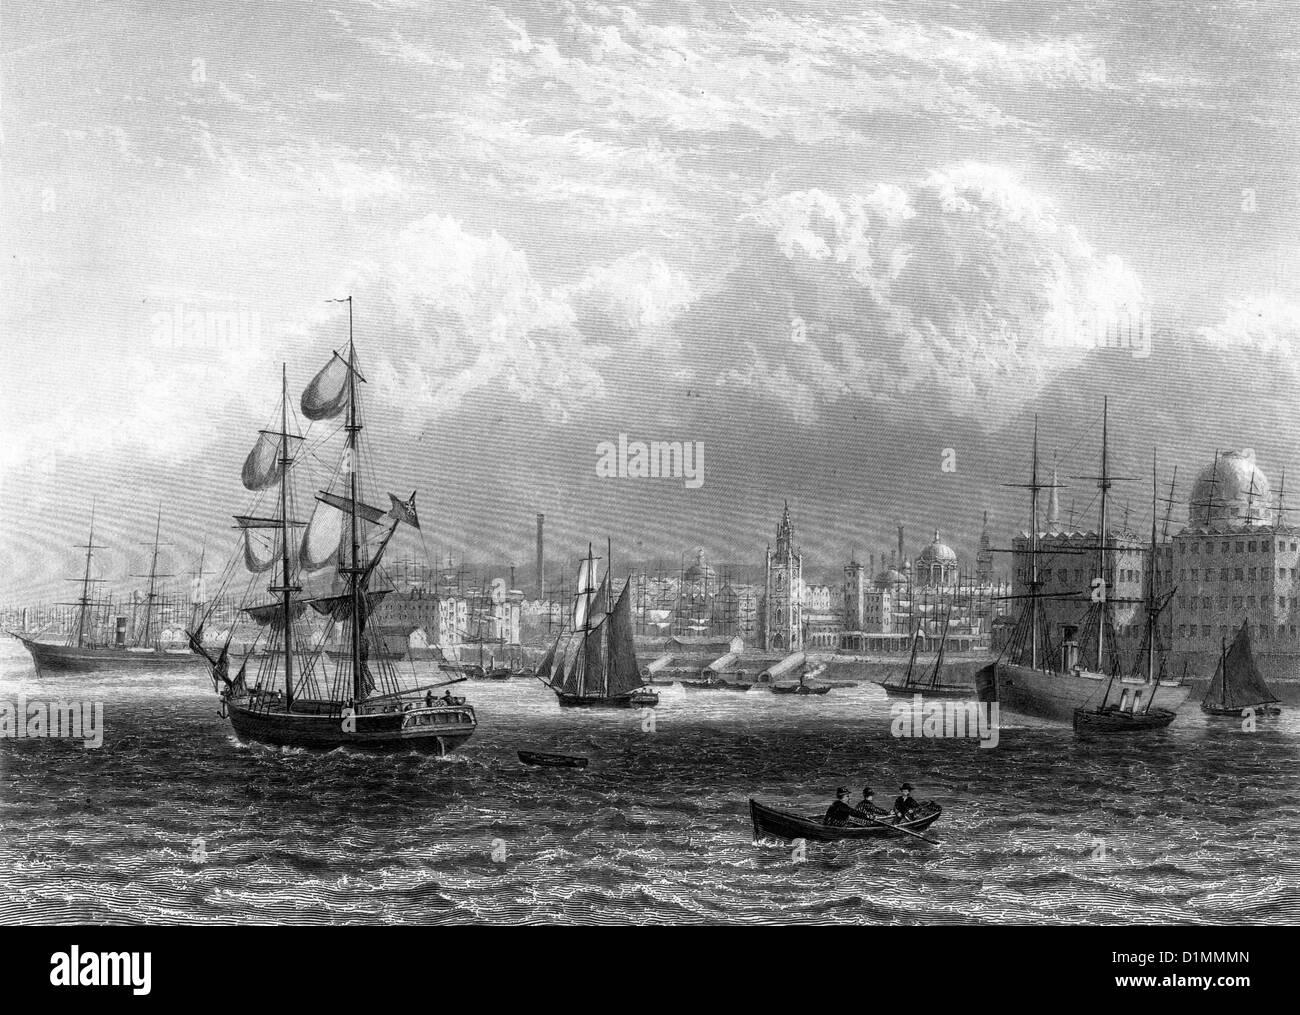 Sailing Ships 1800s Stock Photos Amp Sailing Ships 1800s Stock Images Alamy